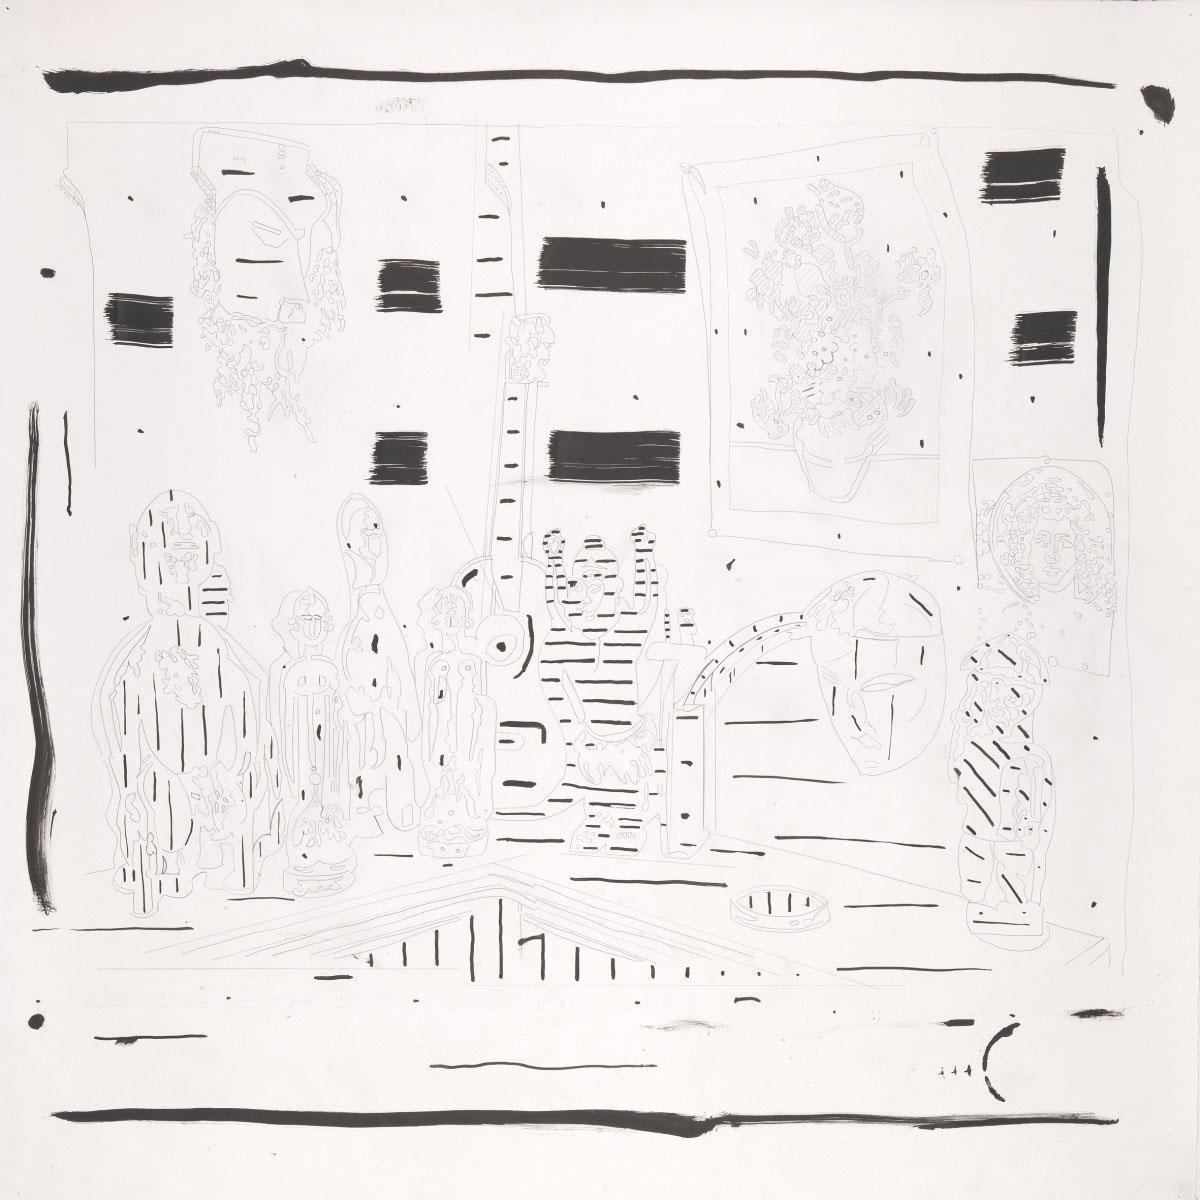 Ania Soliman - Braque's Studio